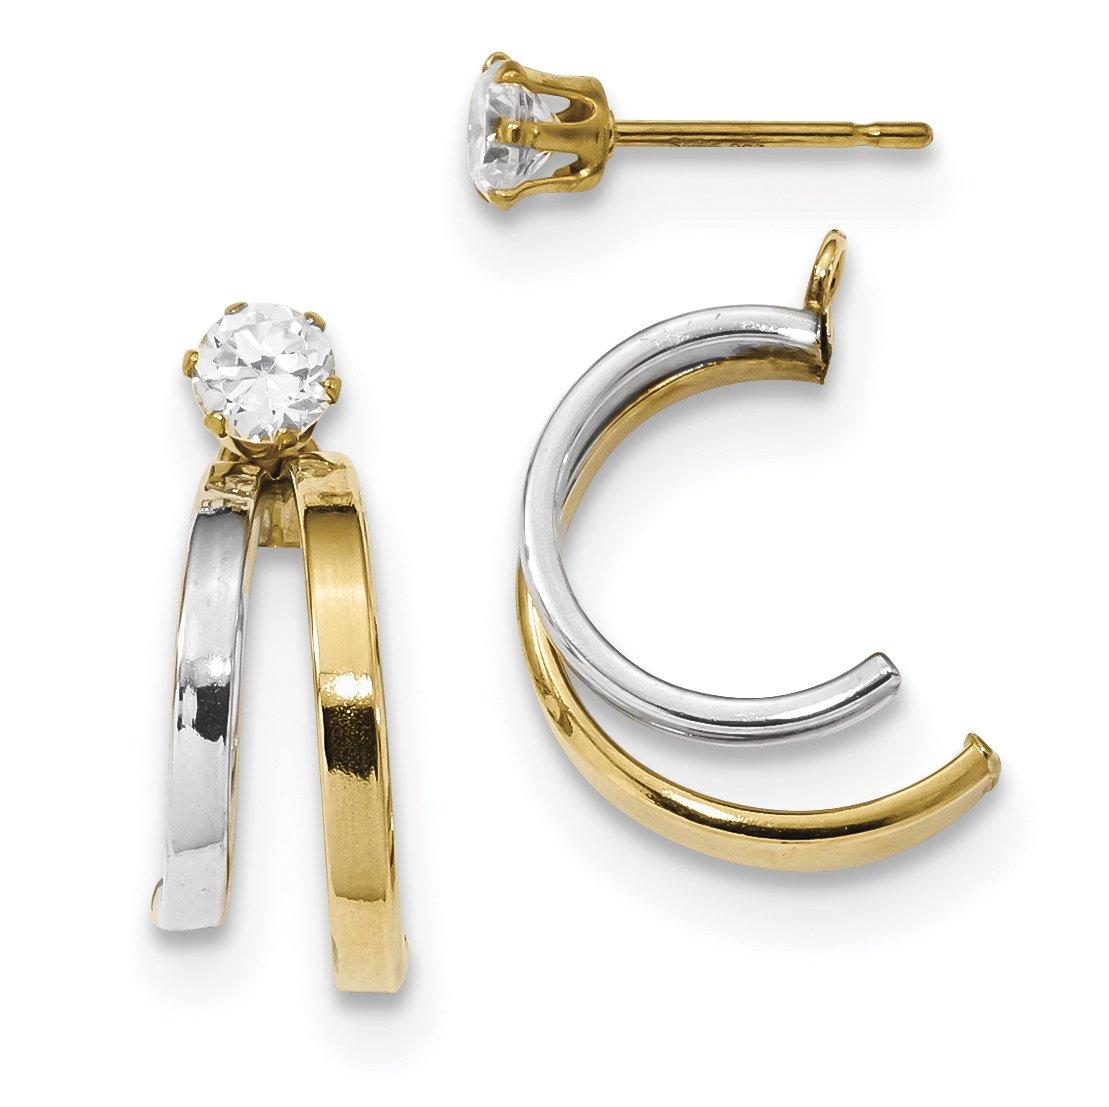 ICE CARATS 14k Two Tone Yellow Gold Double Hoop Earrings Ear Hoops Set Jacket Earring Jackets Studs Cubic Zirconia Cz Ball Button Stud Fine Jewelry Gift Set For Women Heart